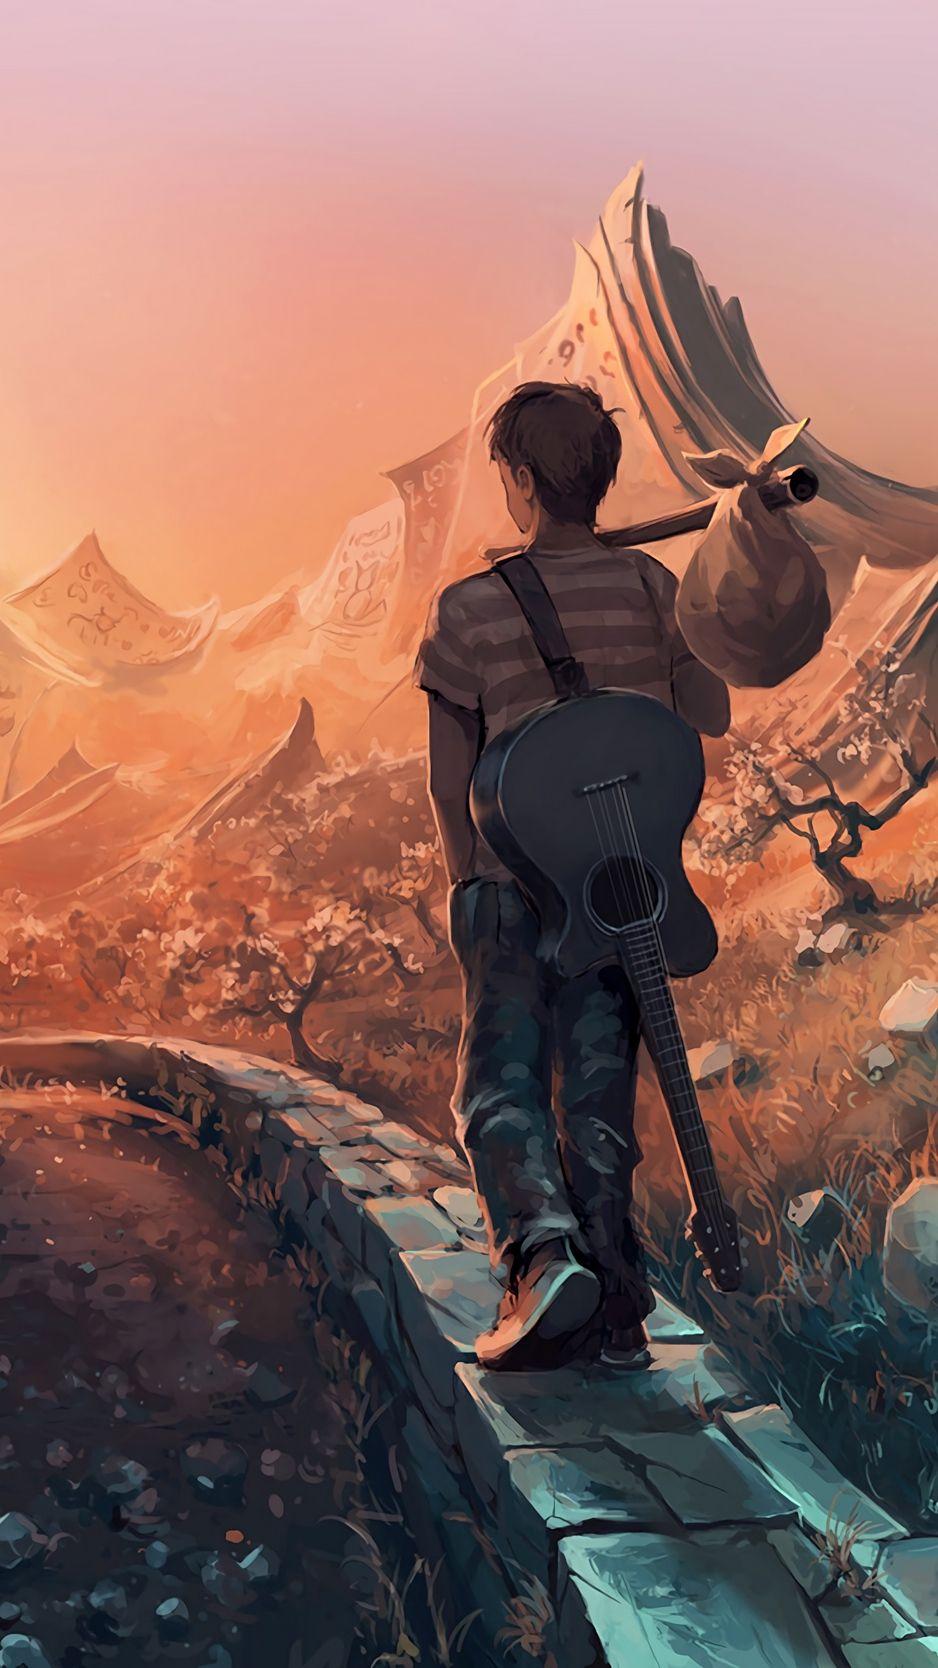 Man Art Guitar Traveling Wallpaper Anime Scenery Wallpaper Lonely Art Alone Art Anime boy with guitar wallpaper